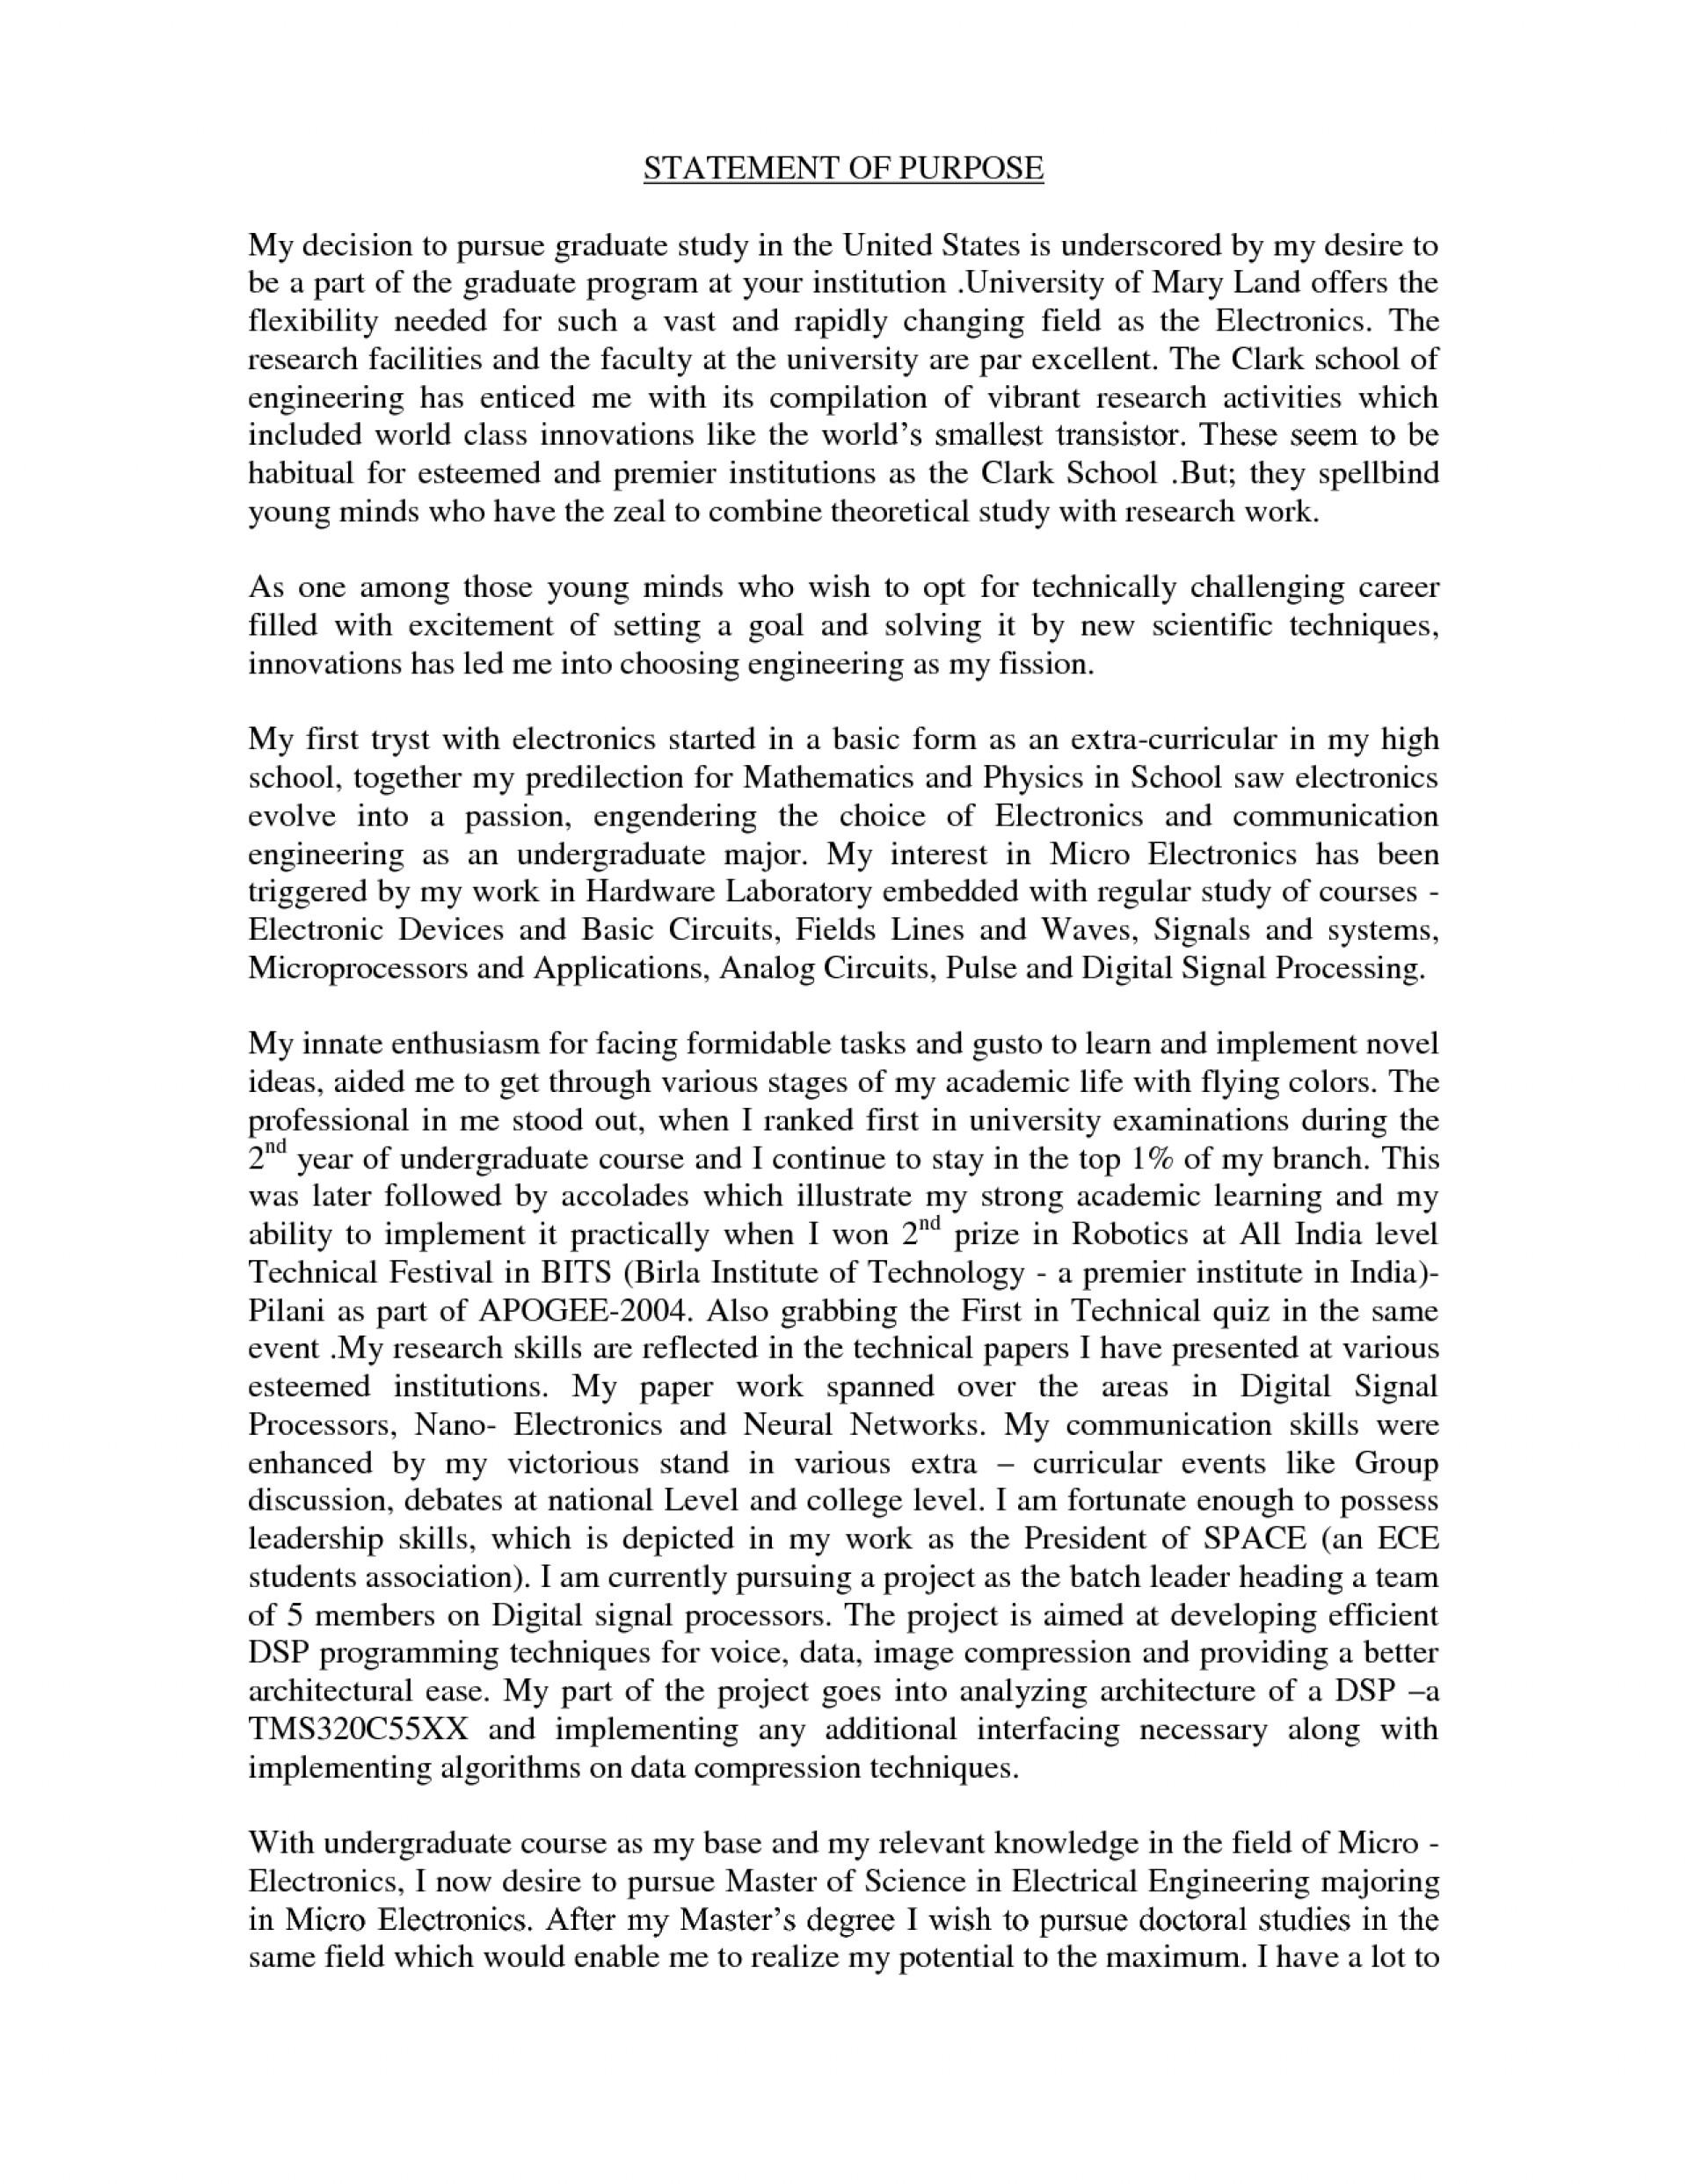 007 Essay Example Statement Of Interest Sample Template M80ewg4r Usc Sensational Prompt Prompts Engineering 2017 1920